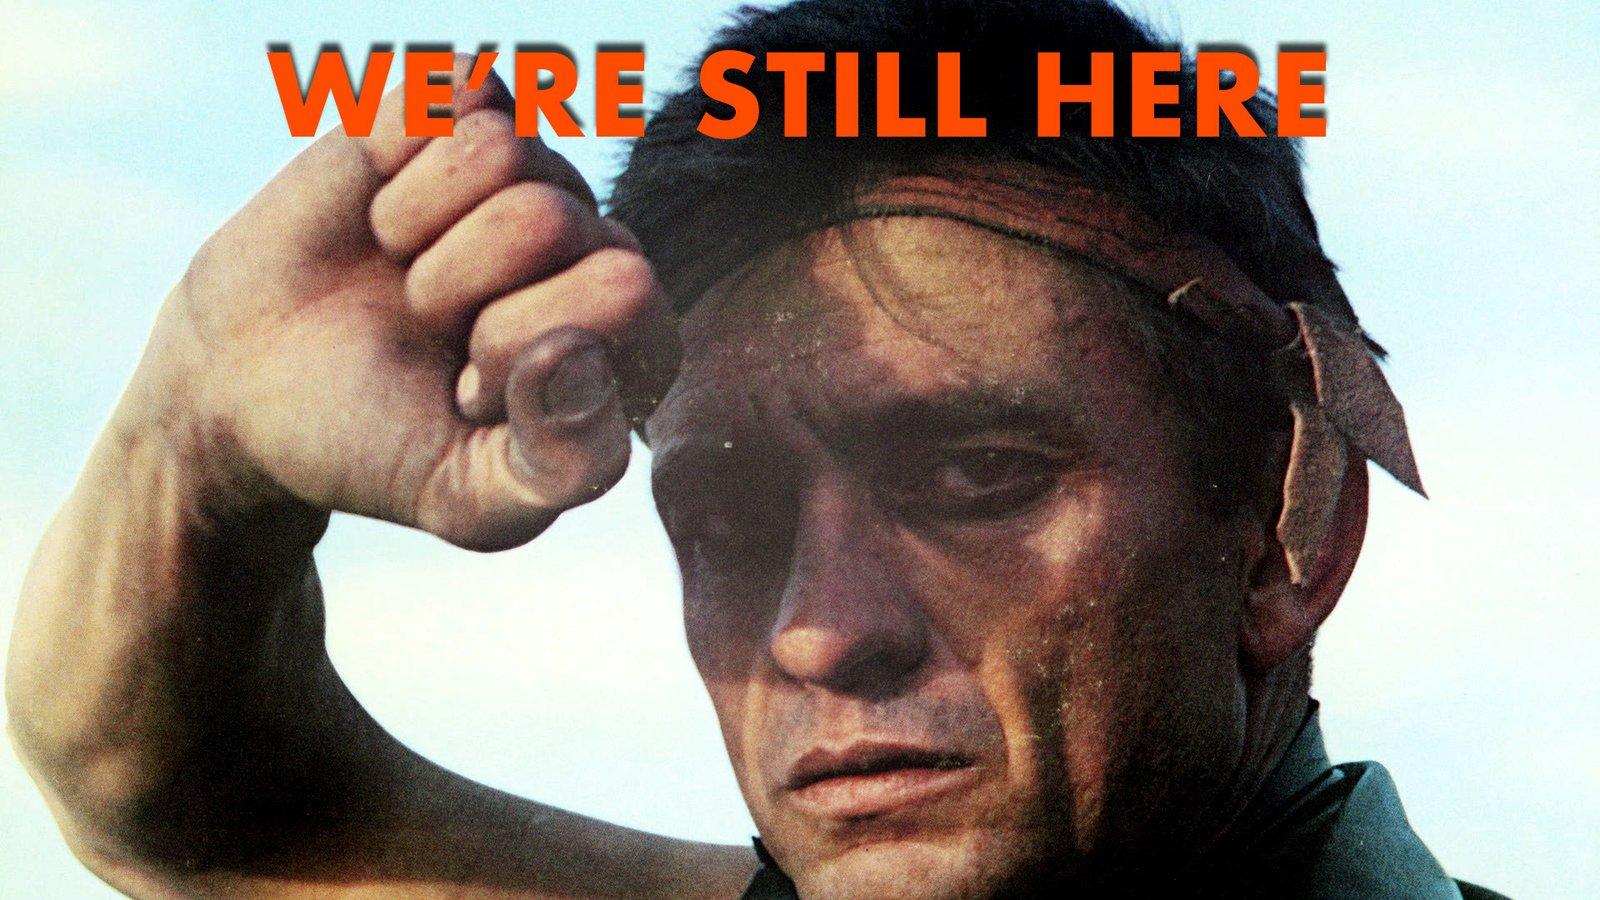 We're Still Here: Johnny Cash